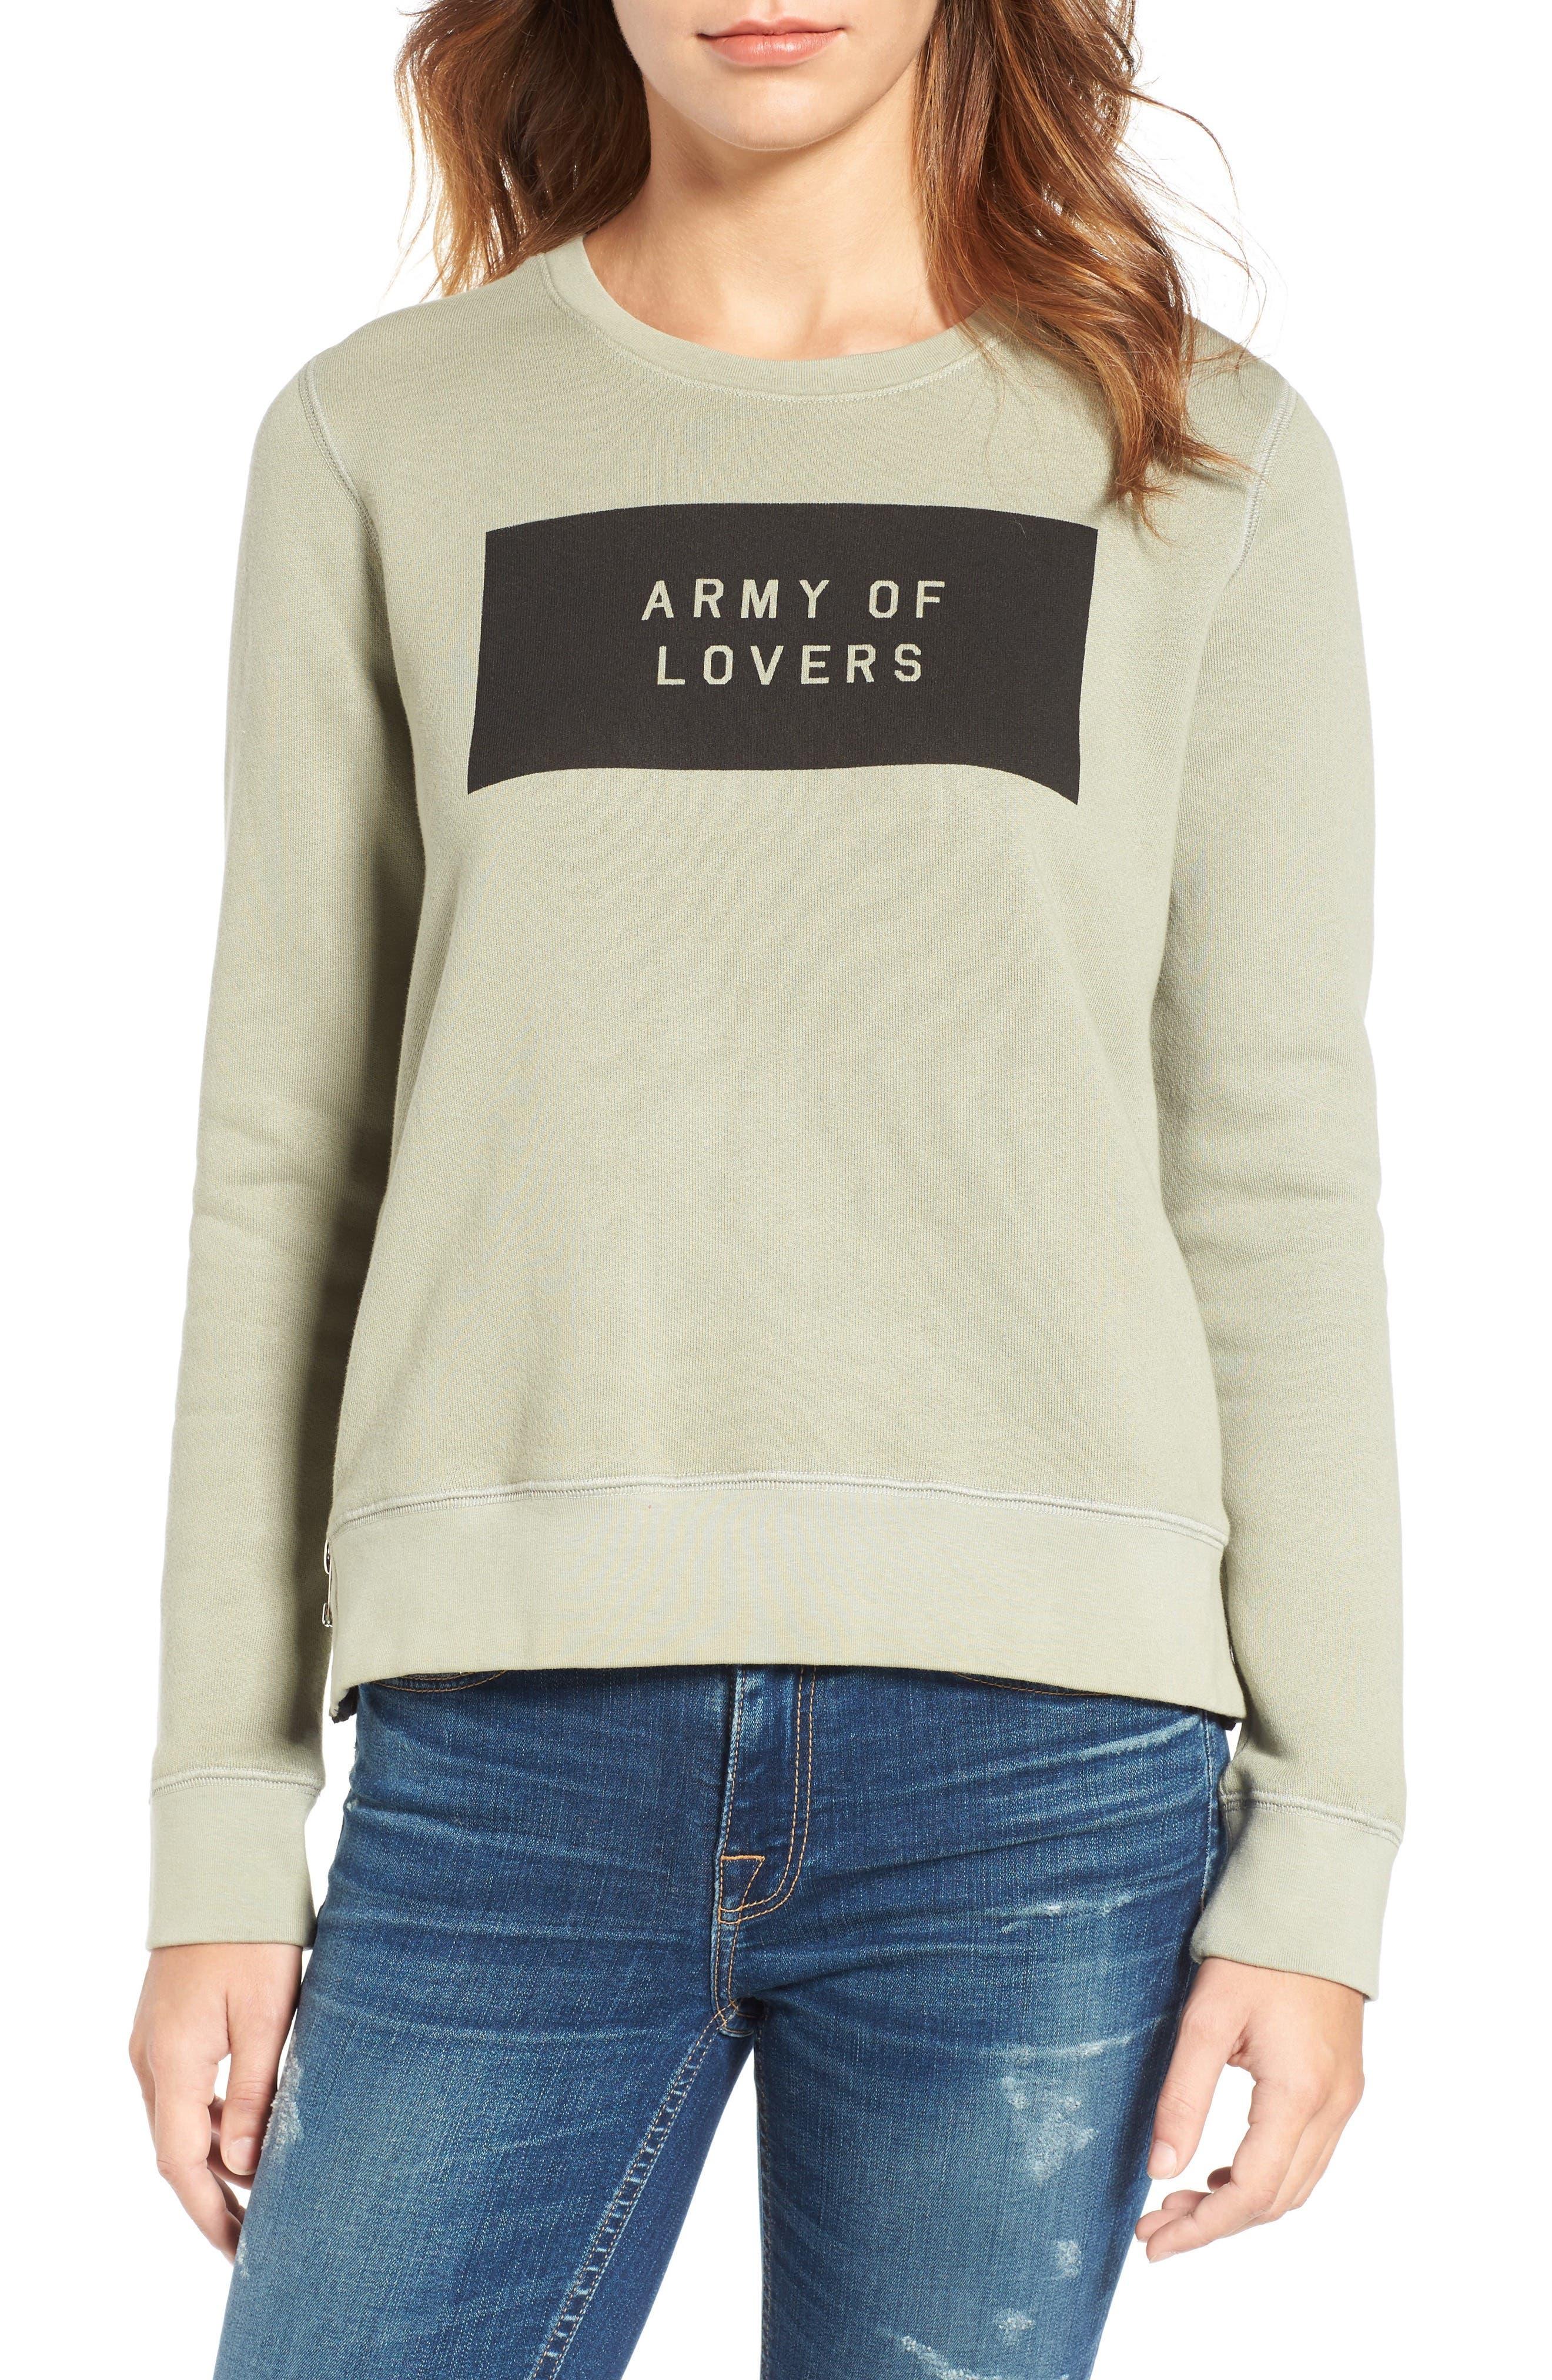 Army of Lovers Side Zip Sweatshirt,                             Alternate thumbnail 2, color,                             301